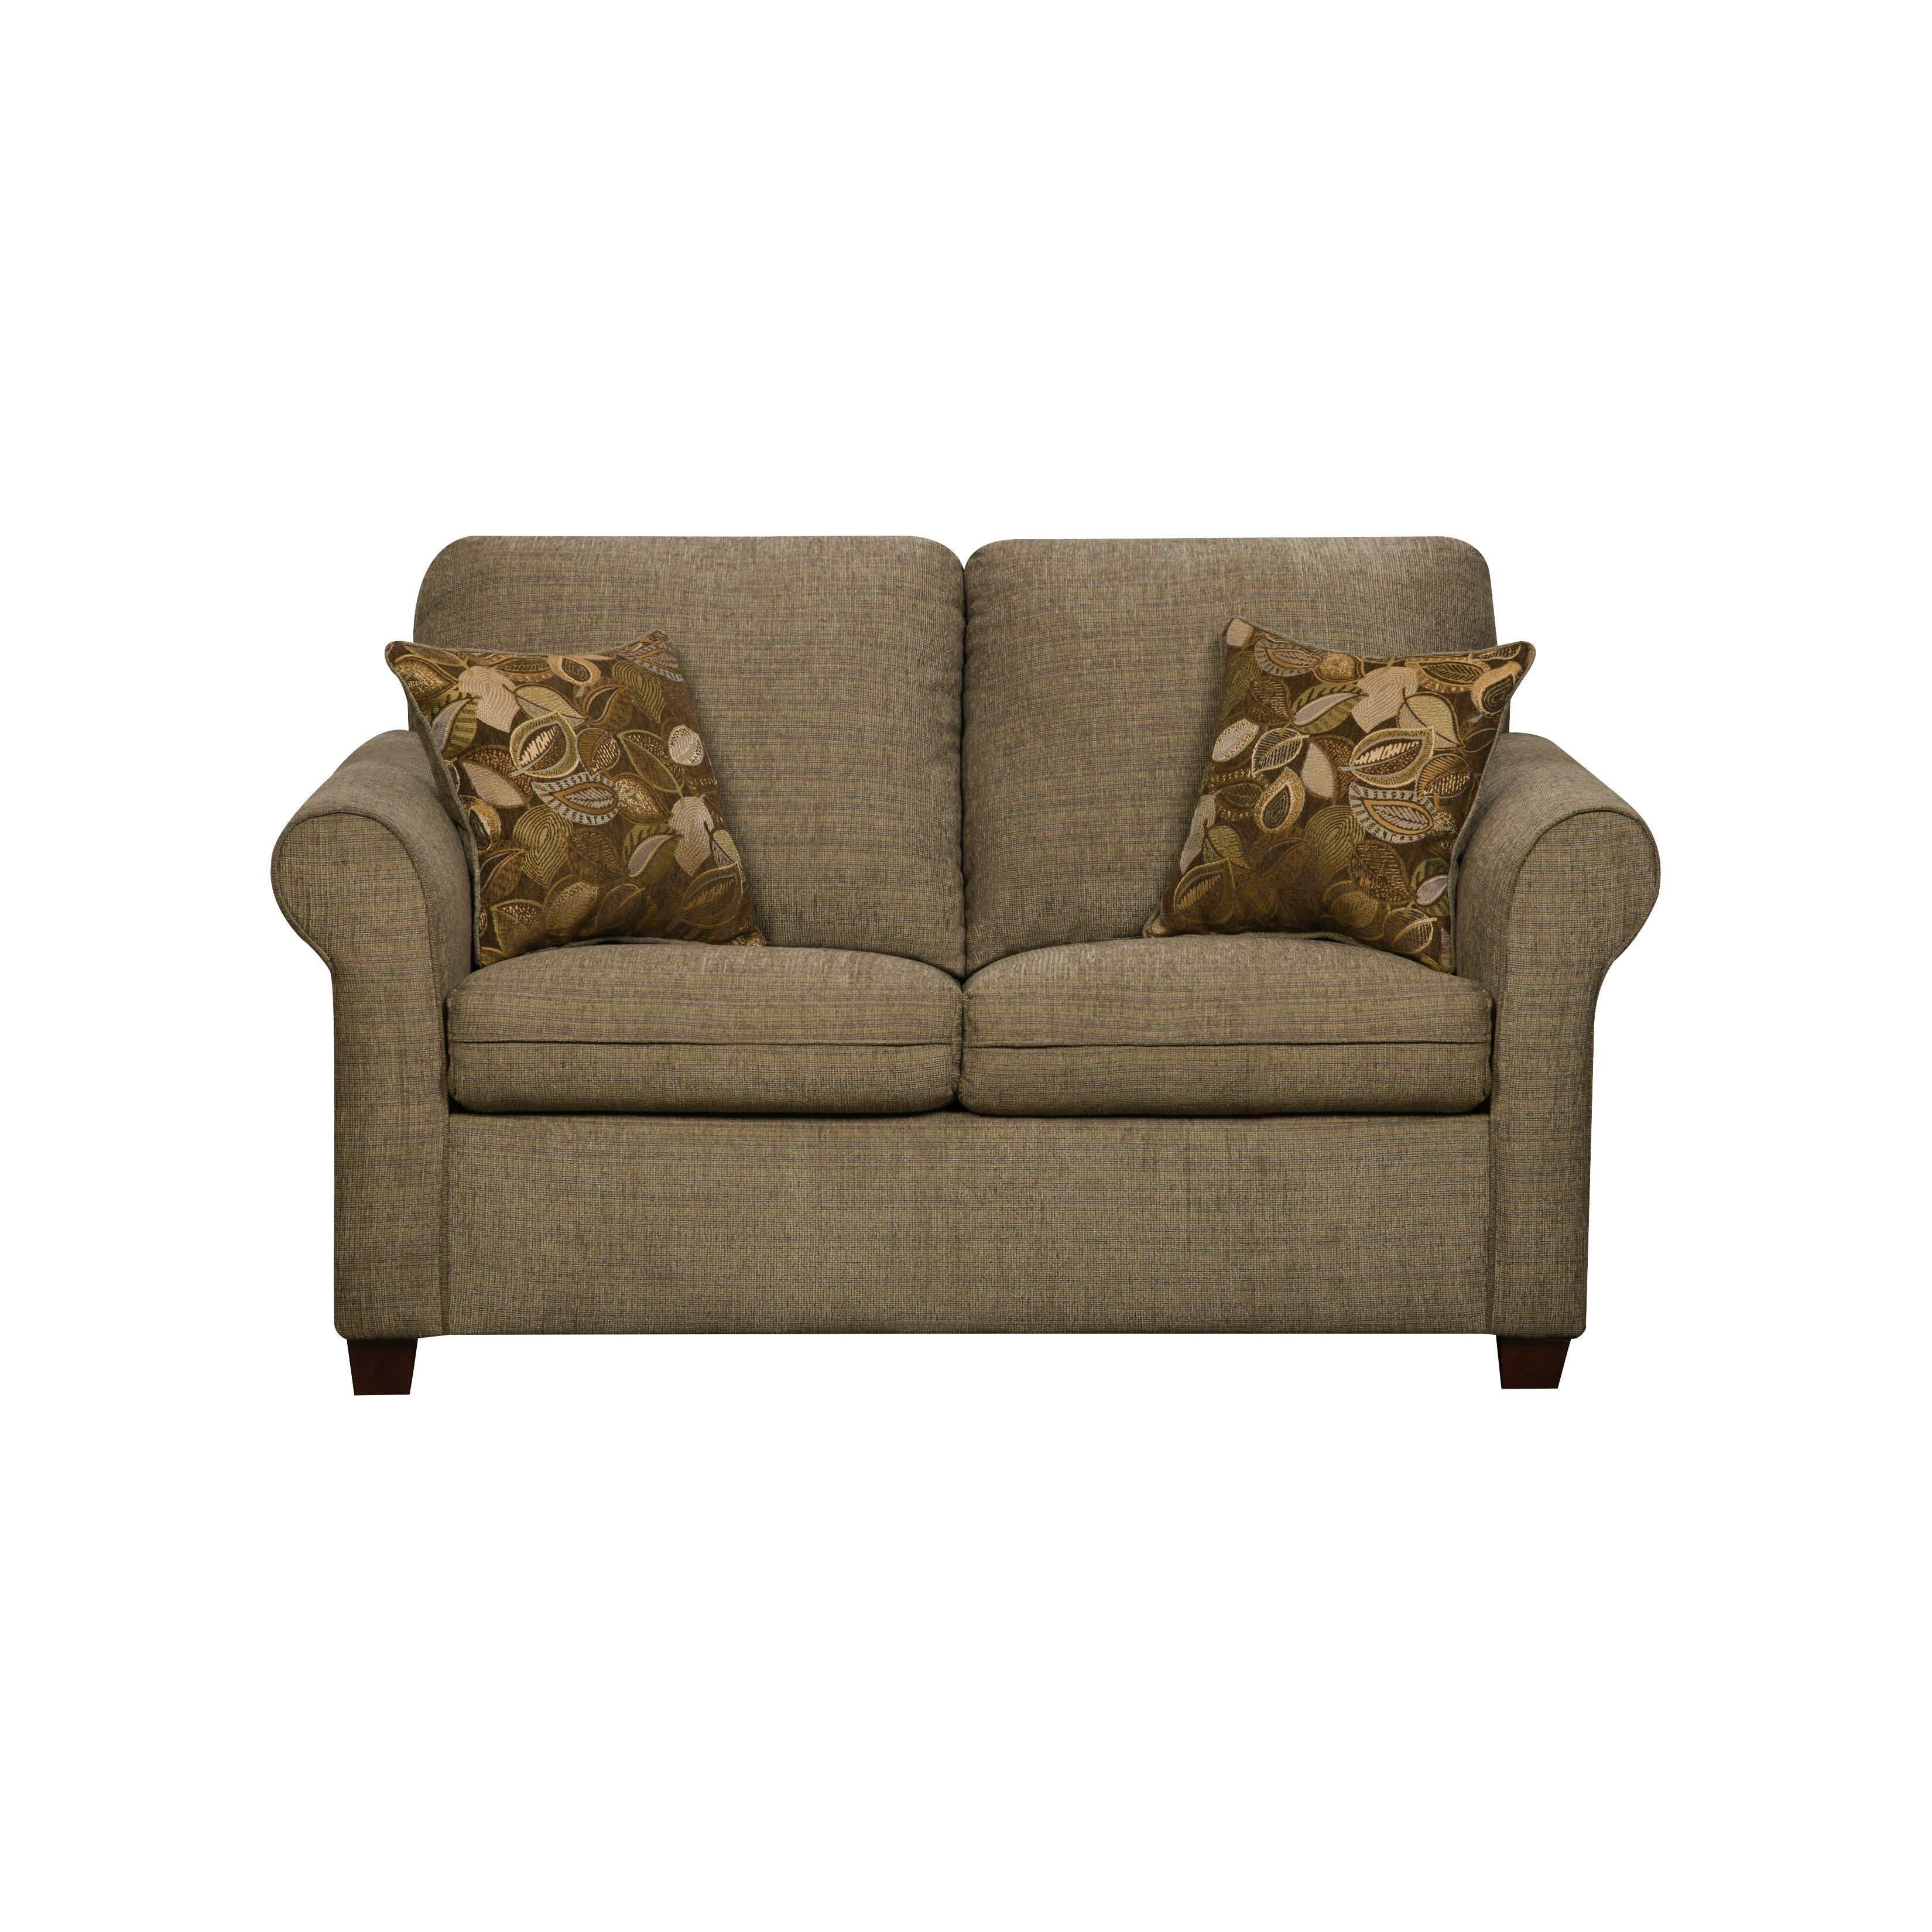 simmons upholstery cullen twin sleeper sofa reviews wayfair. Black Bedroom Furniture Sets. Home Design Ideas